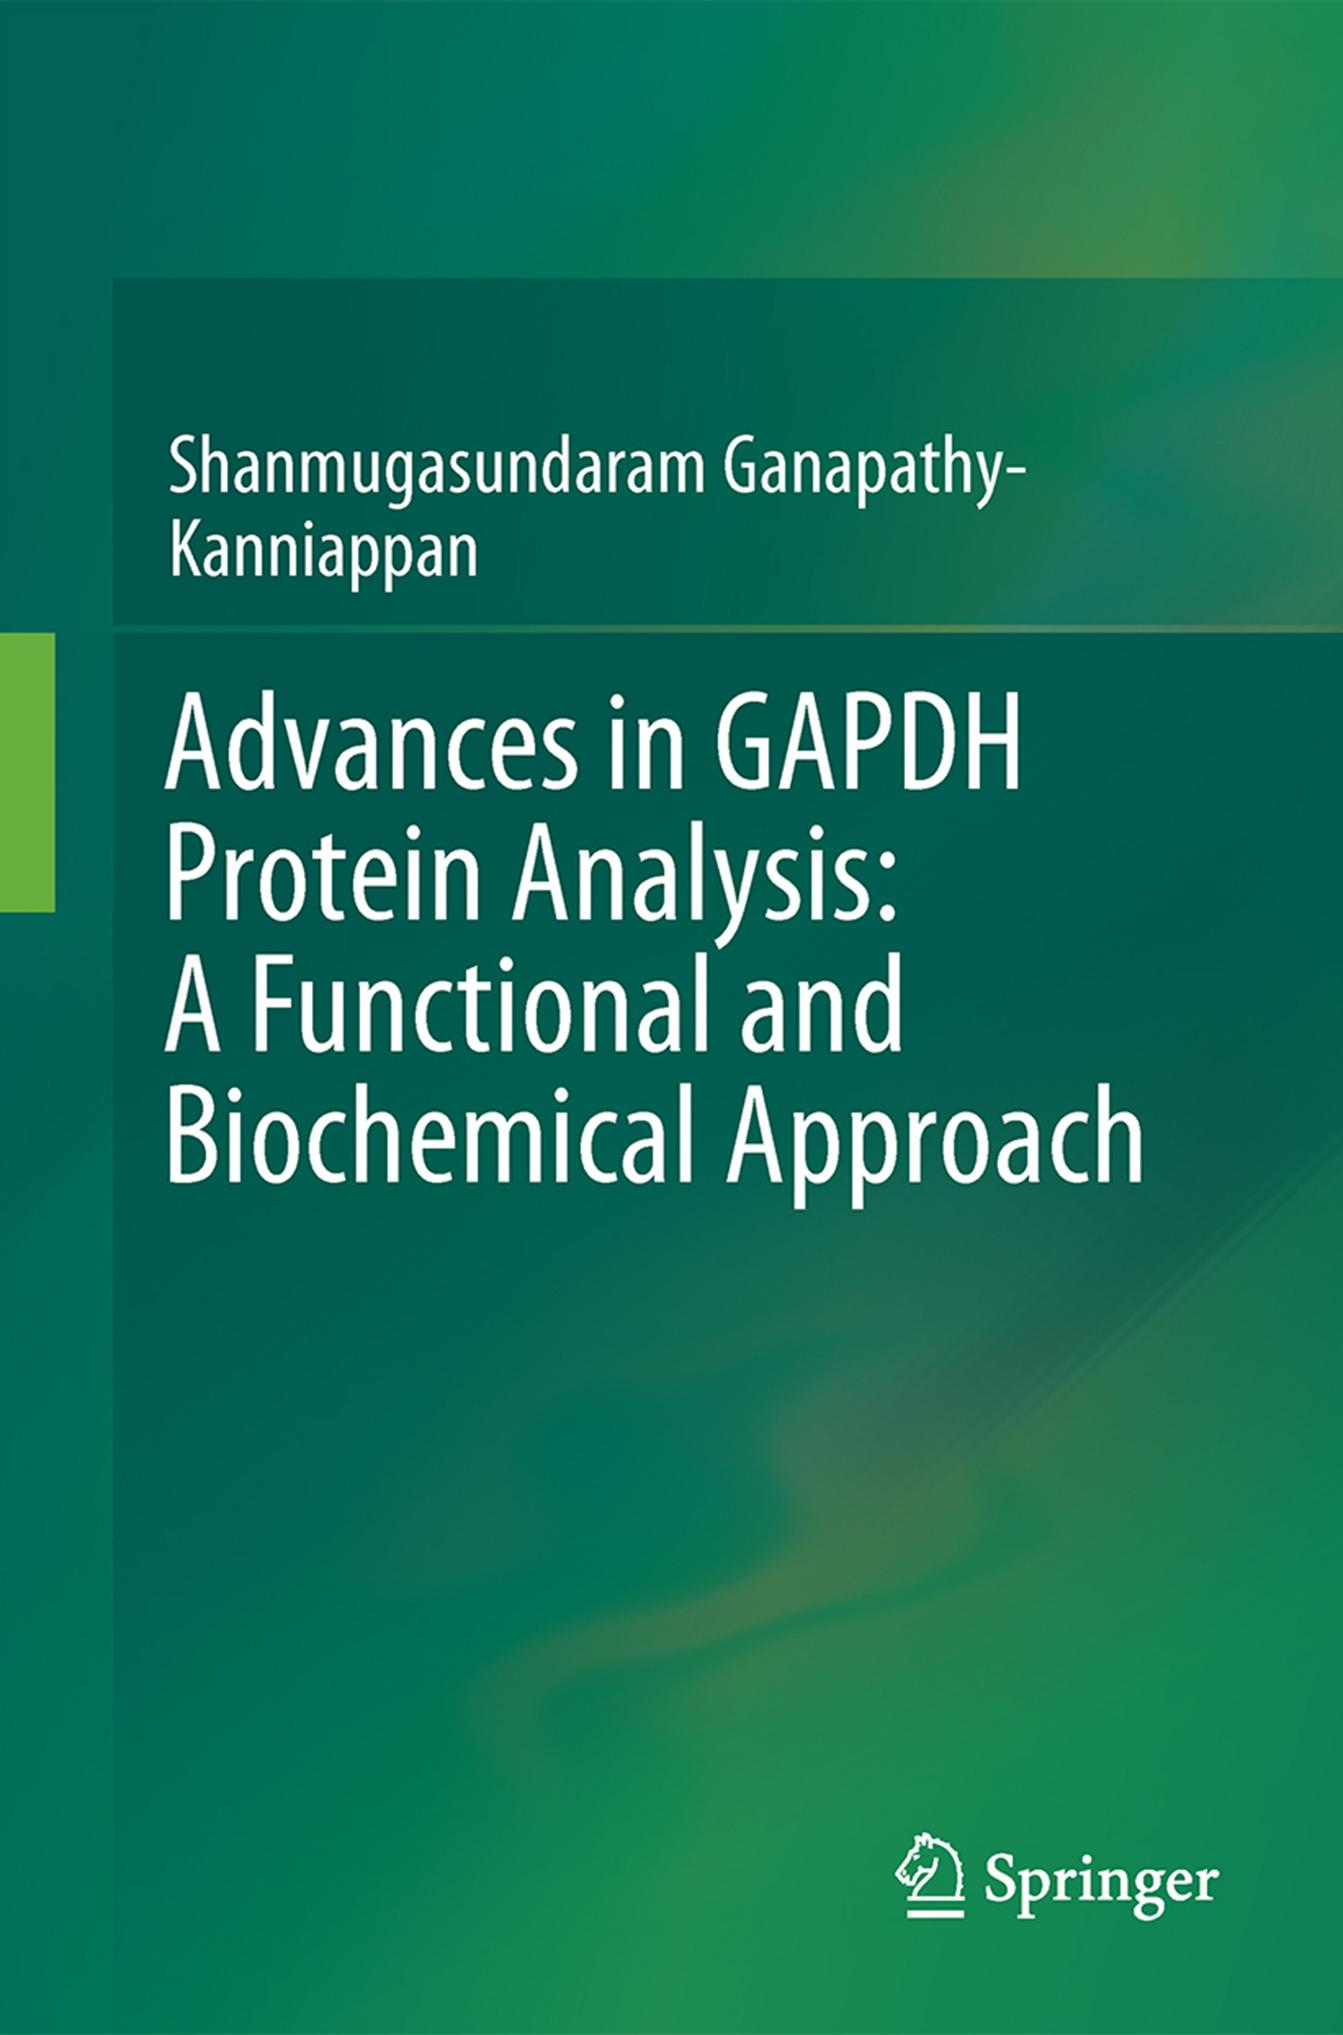 Ganapathy-Kanniappan, Shanmugasundaram - Advances in GAPDH Protein Analysis: A Functional and Biochemical Approach, e-bok